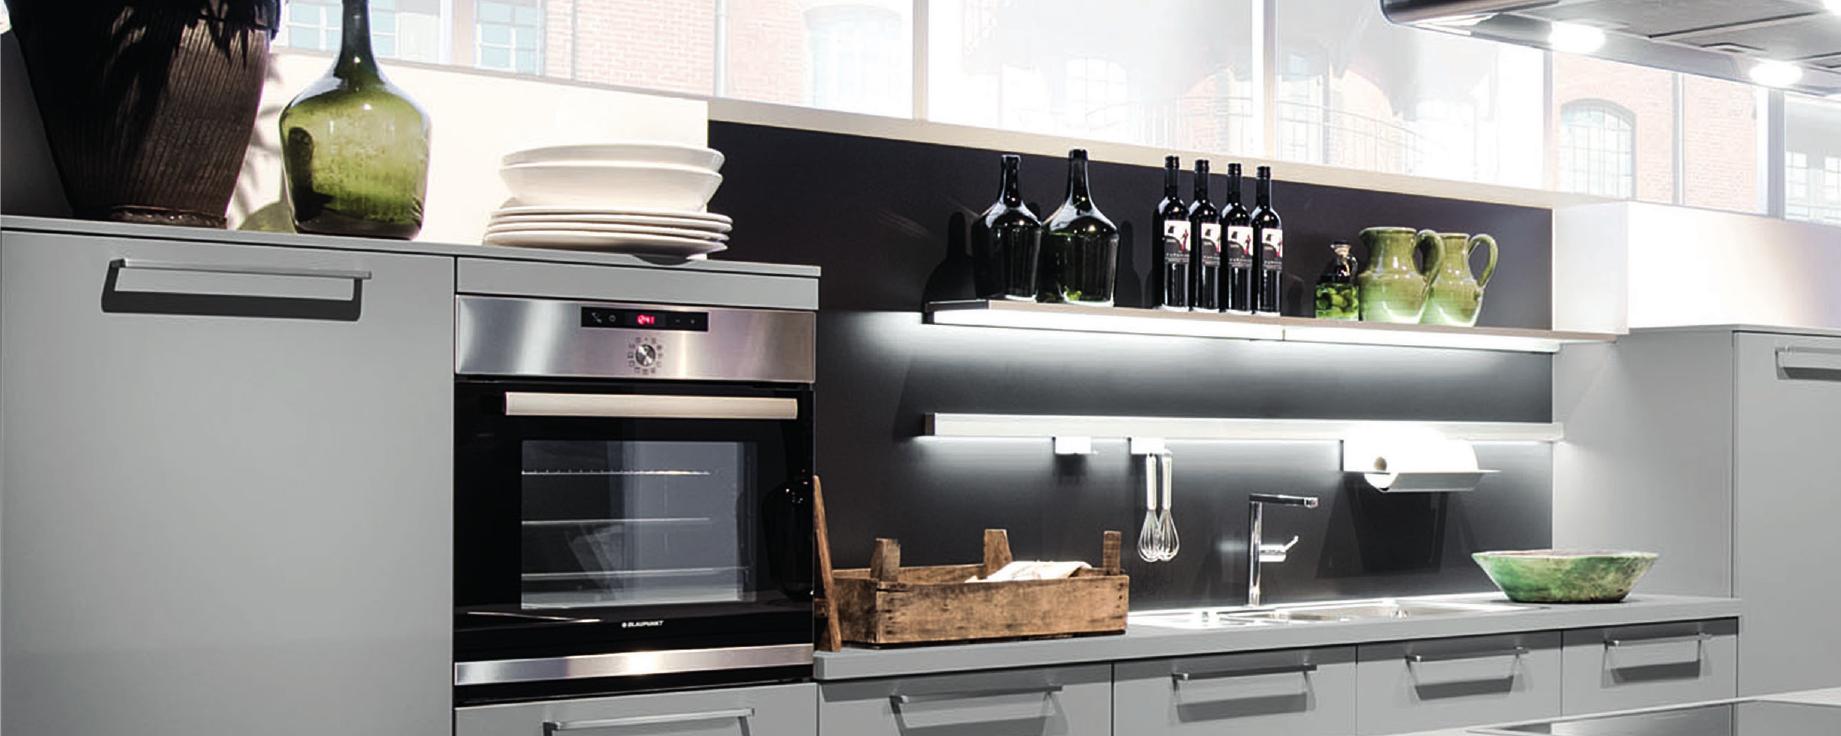 The Renaissance of HPL in Kitchen Design